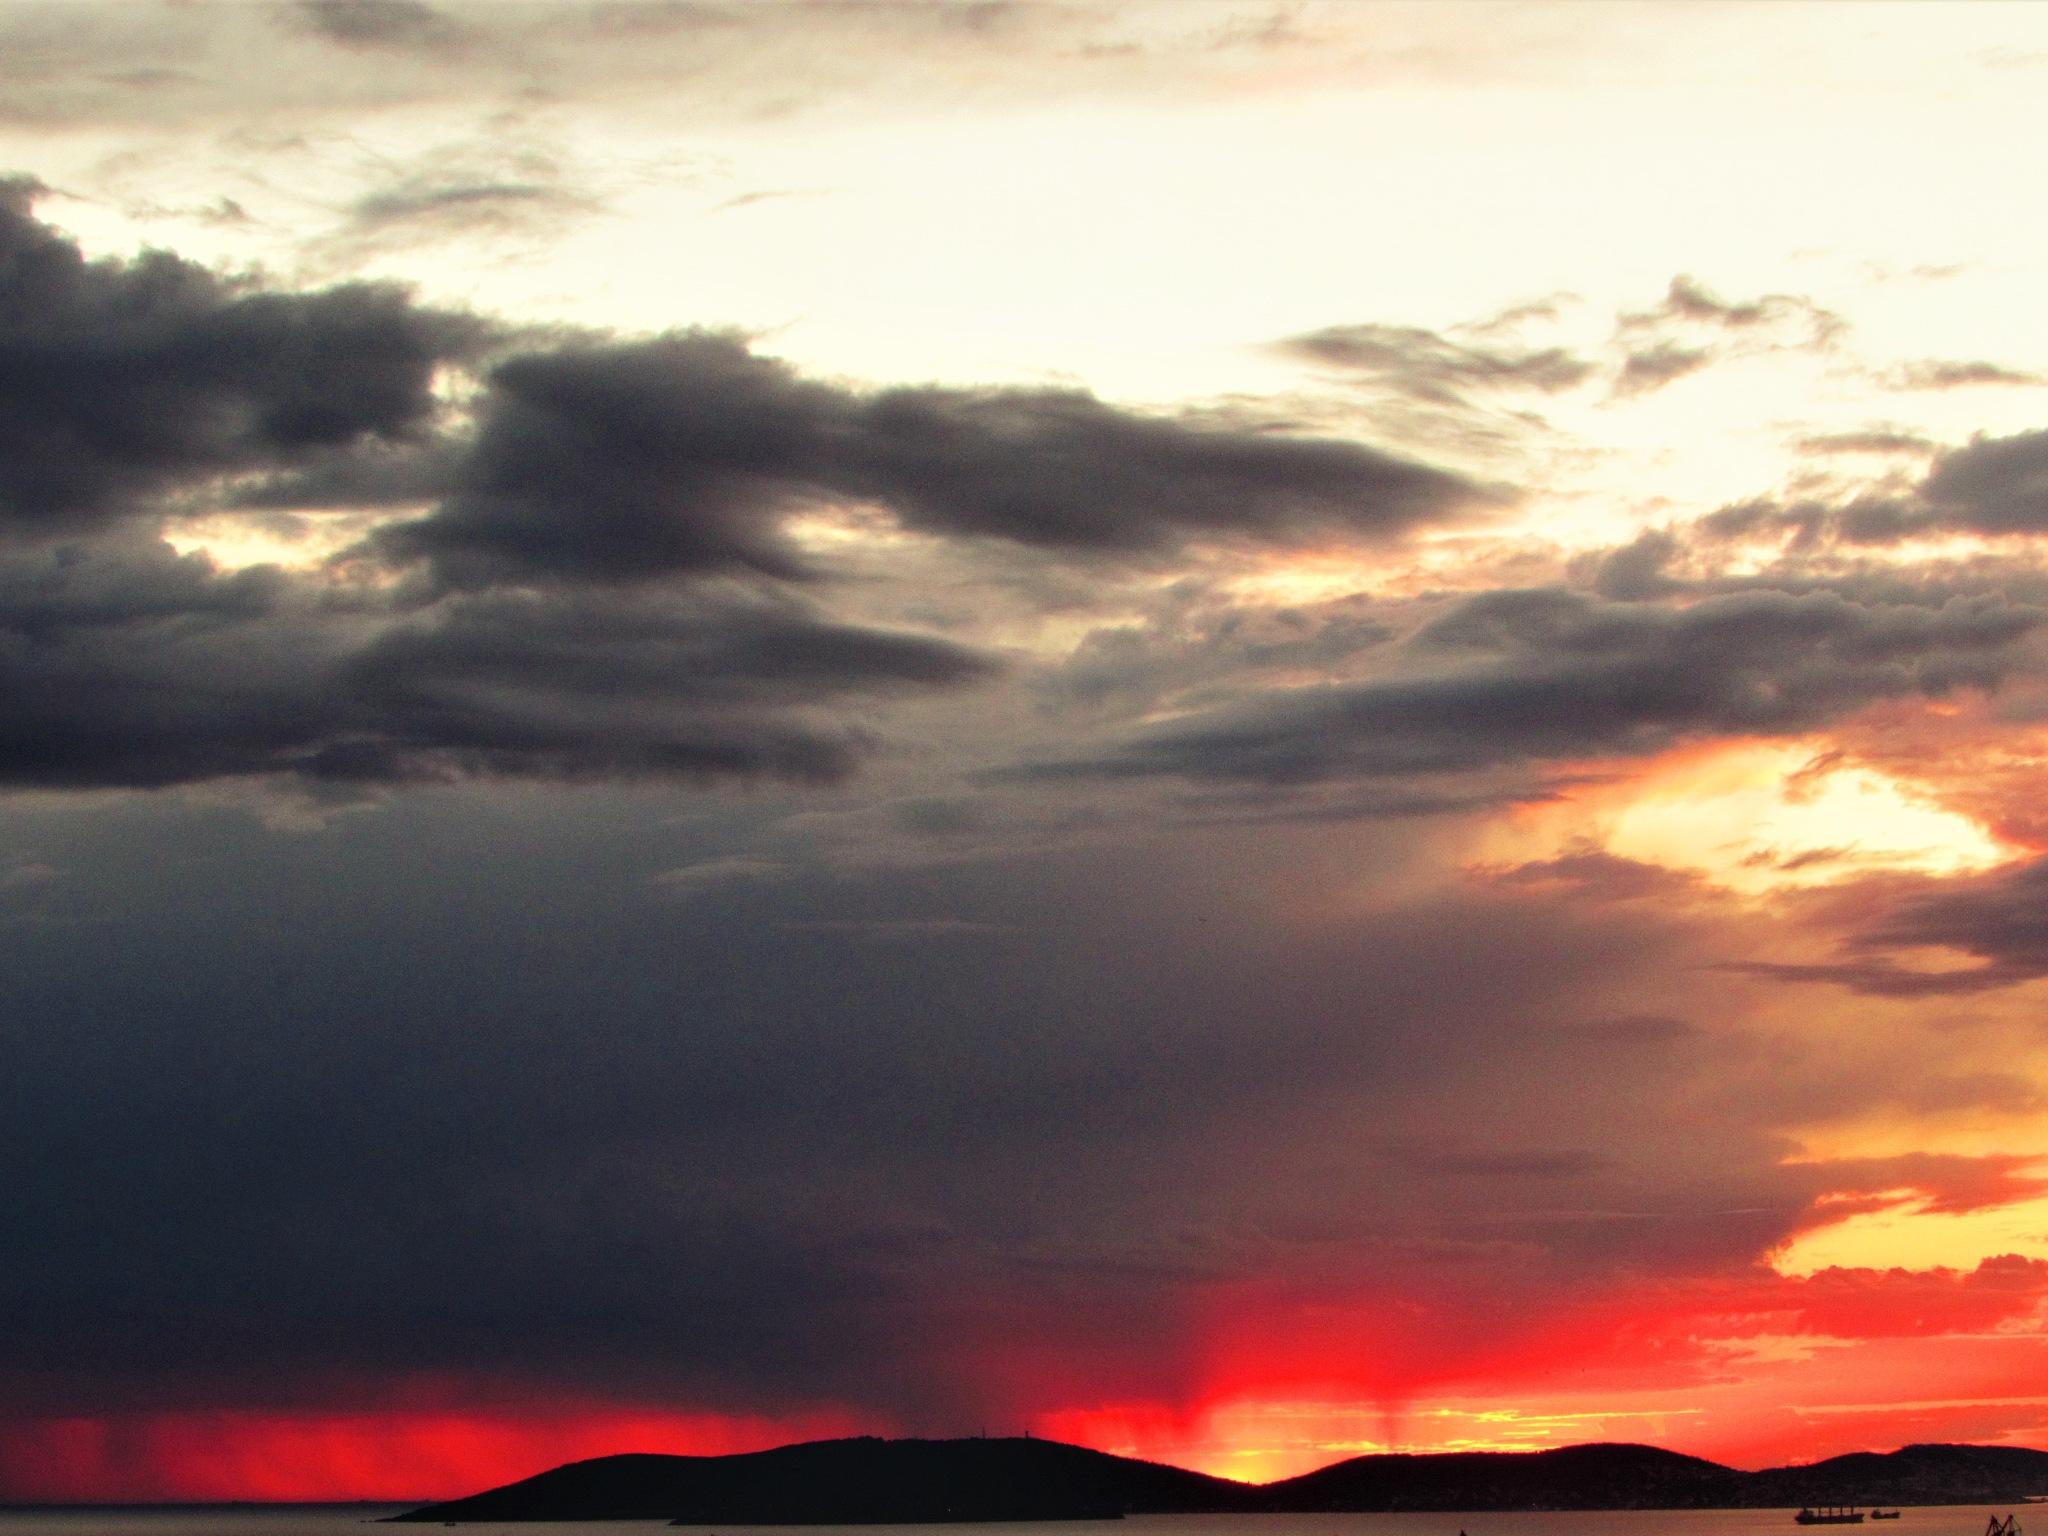 SUNSET AT İSTANBUL by nejatgencer